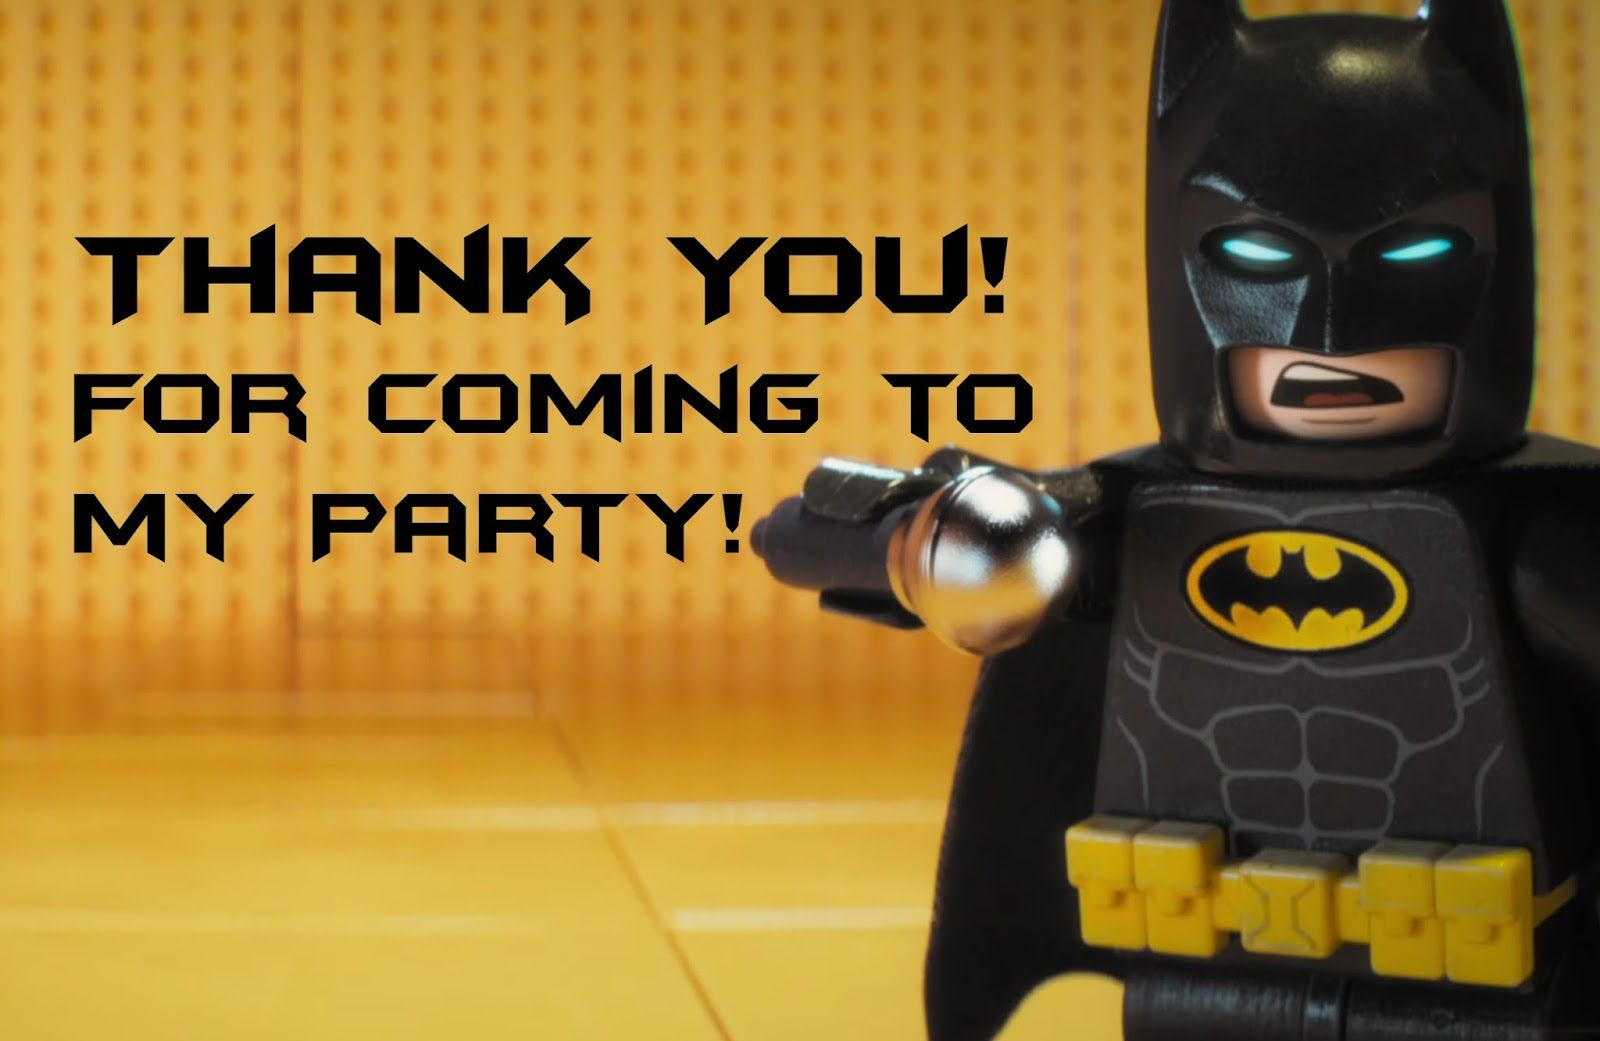 Lego Batman Thank You Cards | Lego Batman-Super Heros Printables - Free Printable Lego Batman